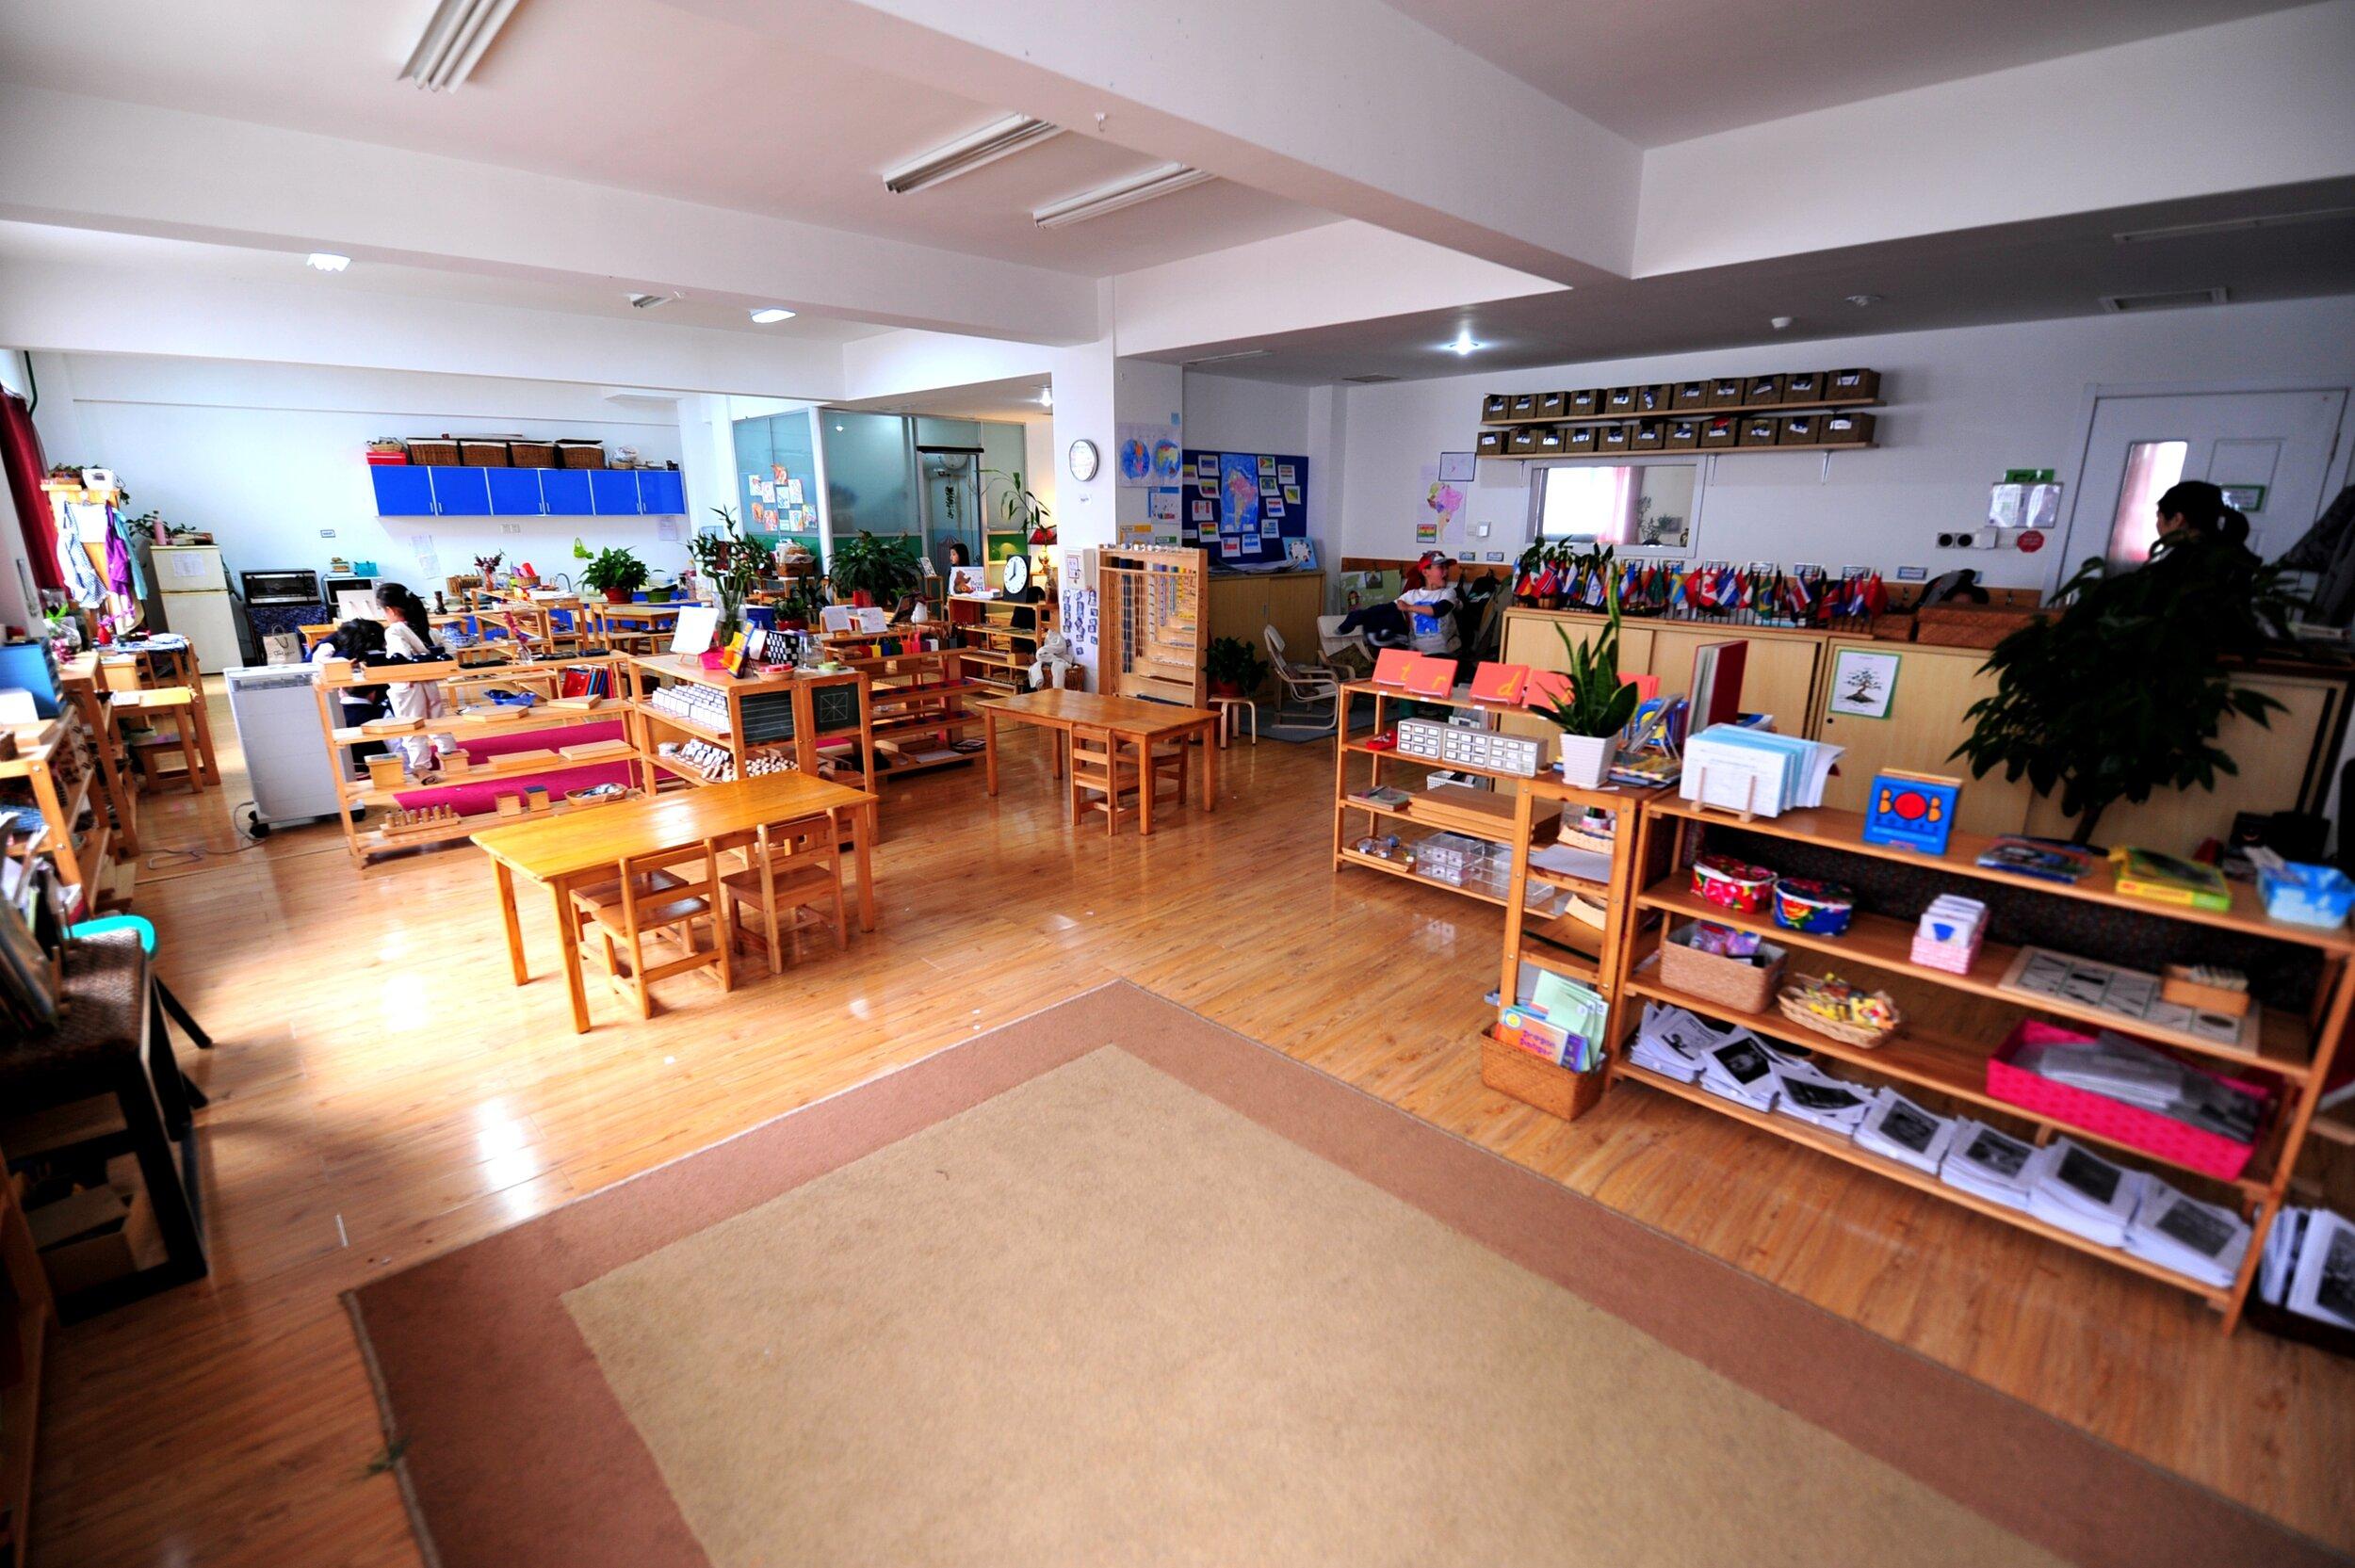 A typical Montessori classroom   Source: Natalie Cho, WikiCommons